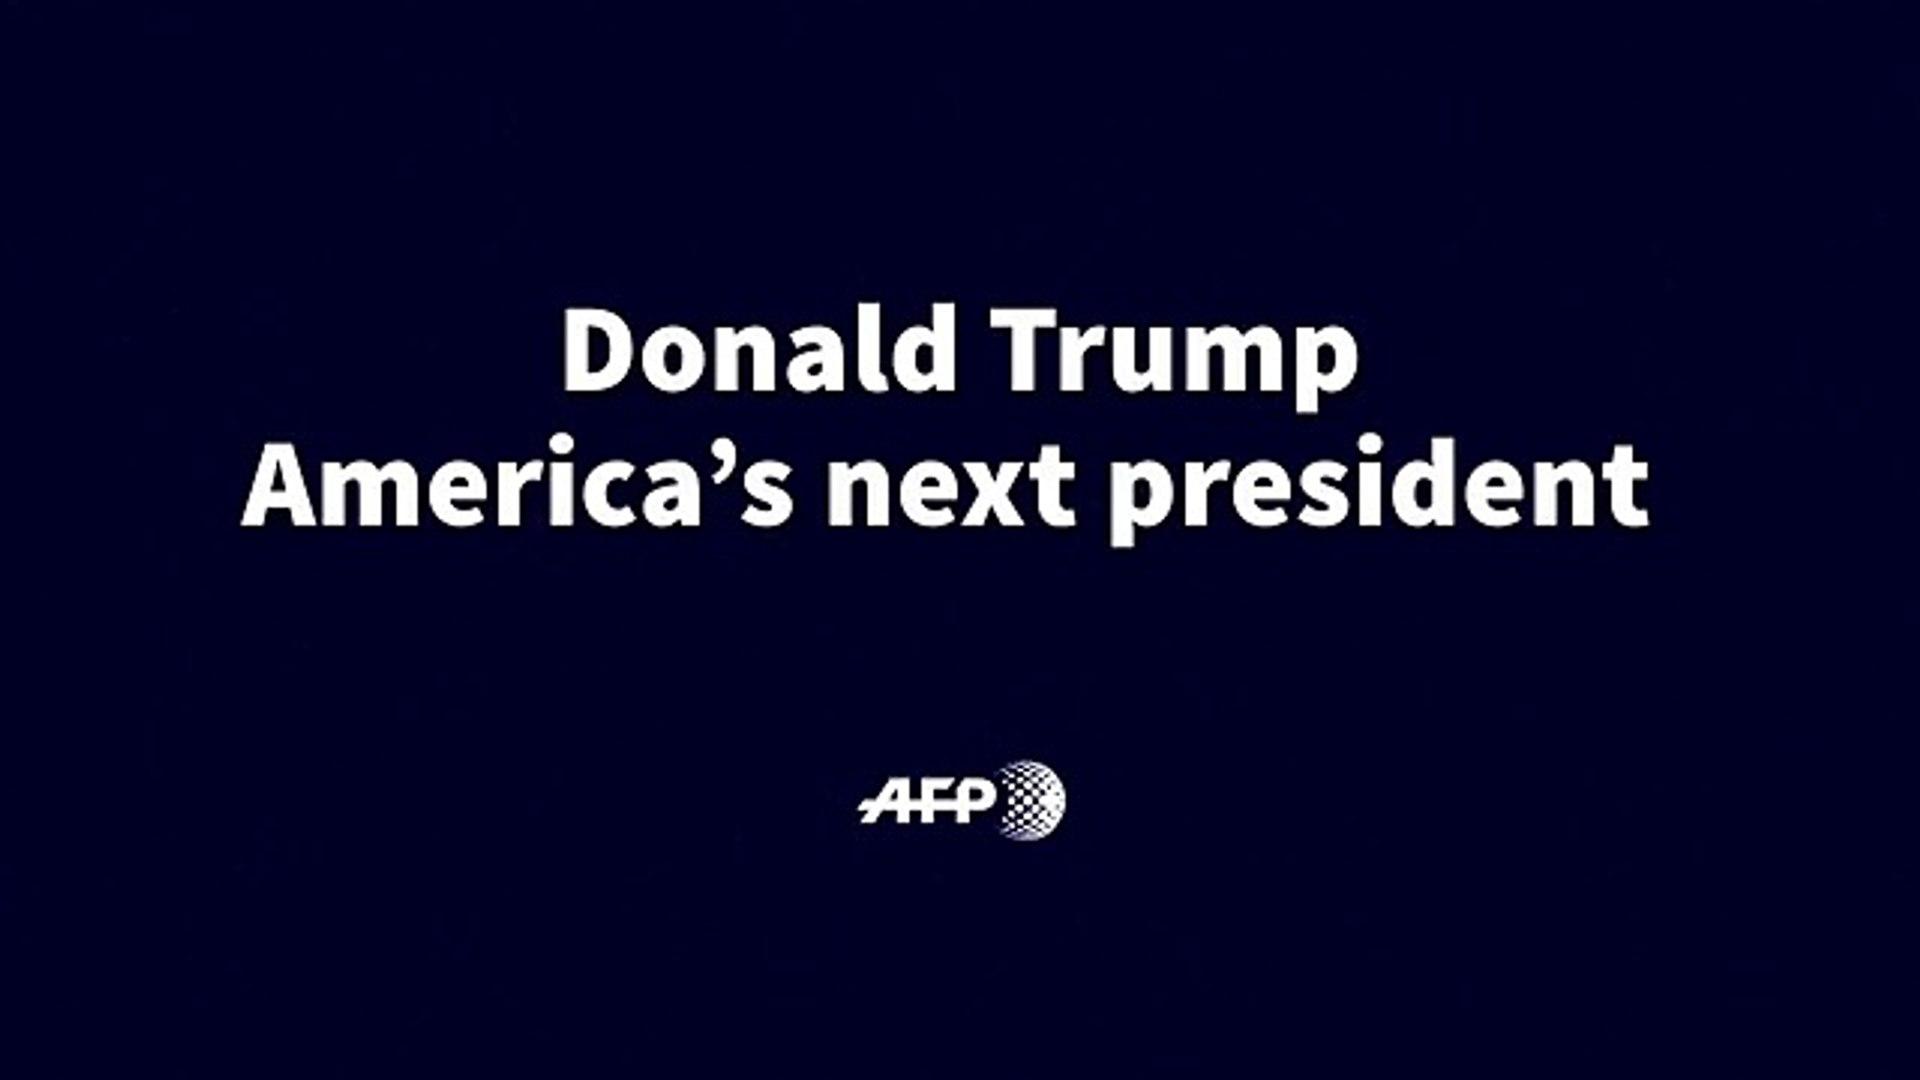 Donald Trump, America's ne